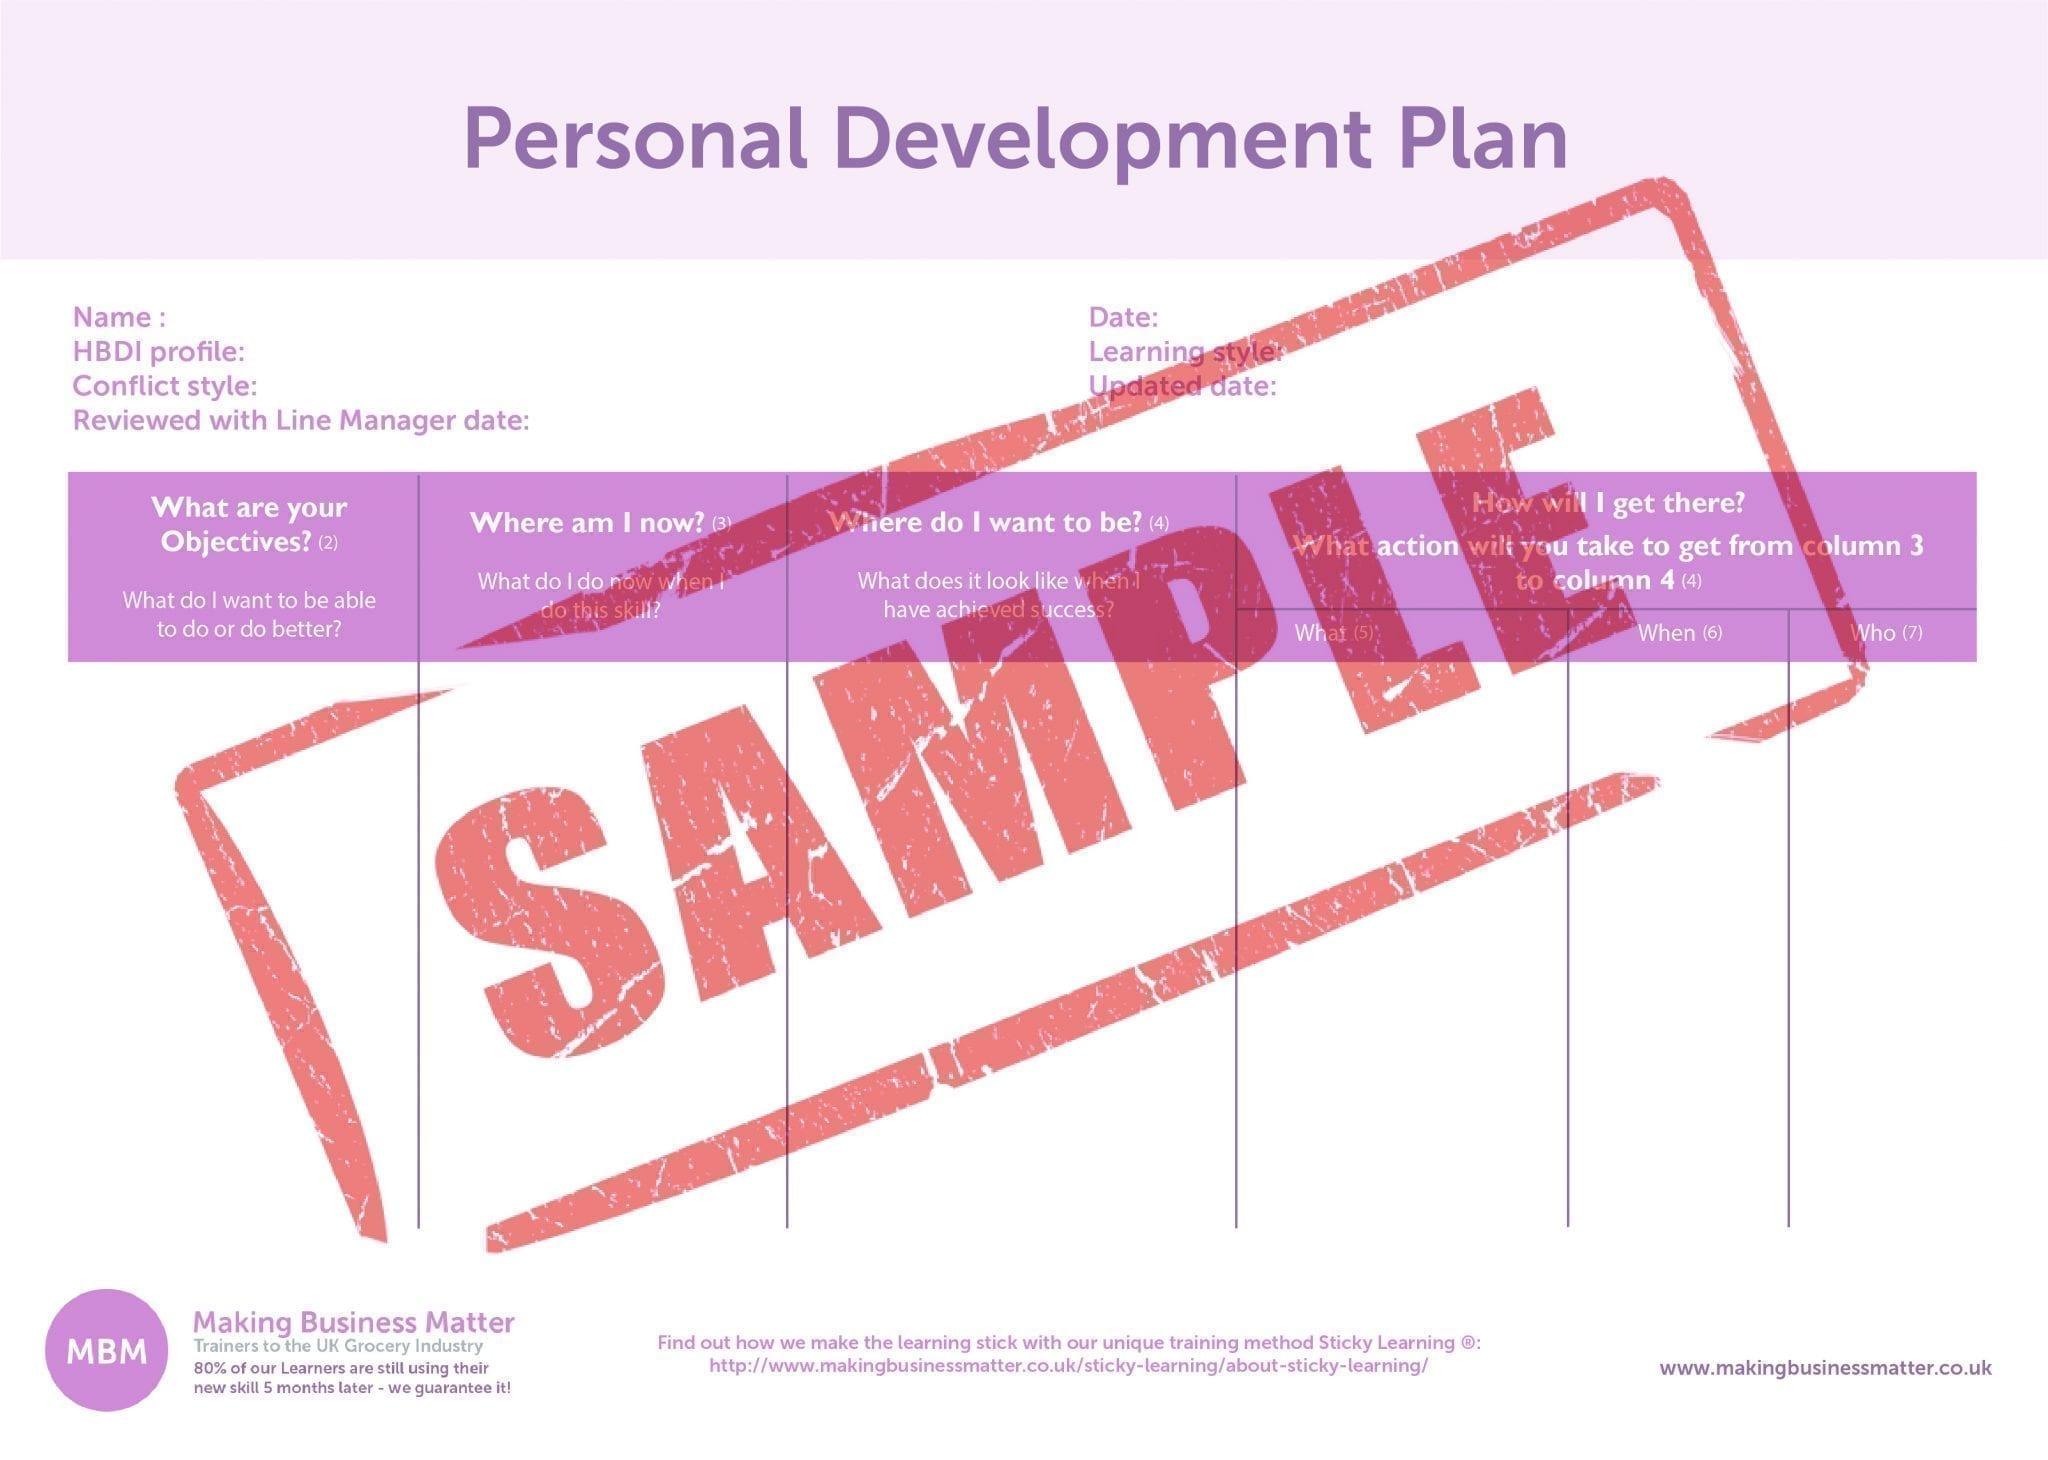 Personal Development Plan, Sample Image